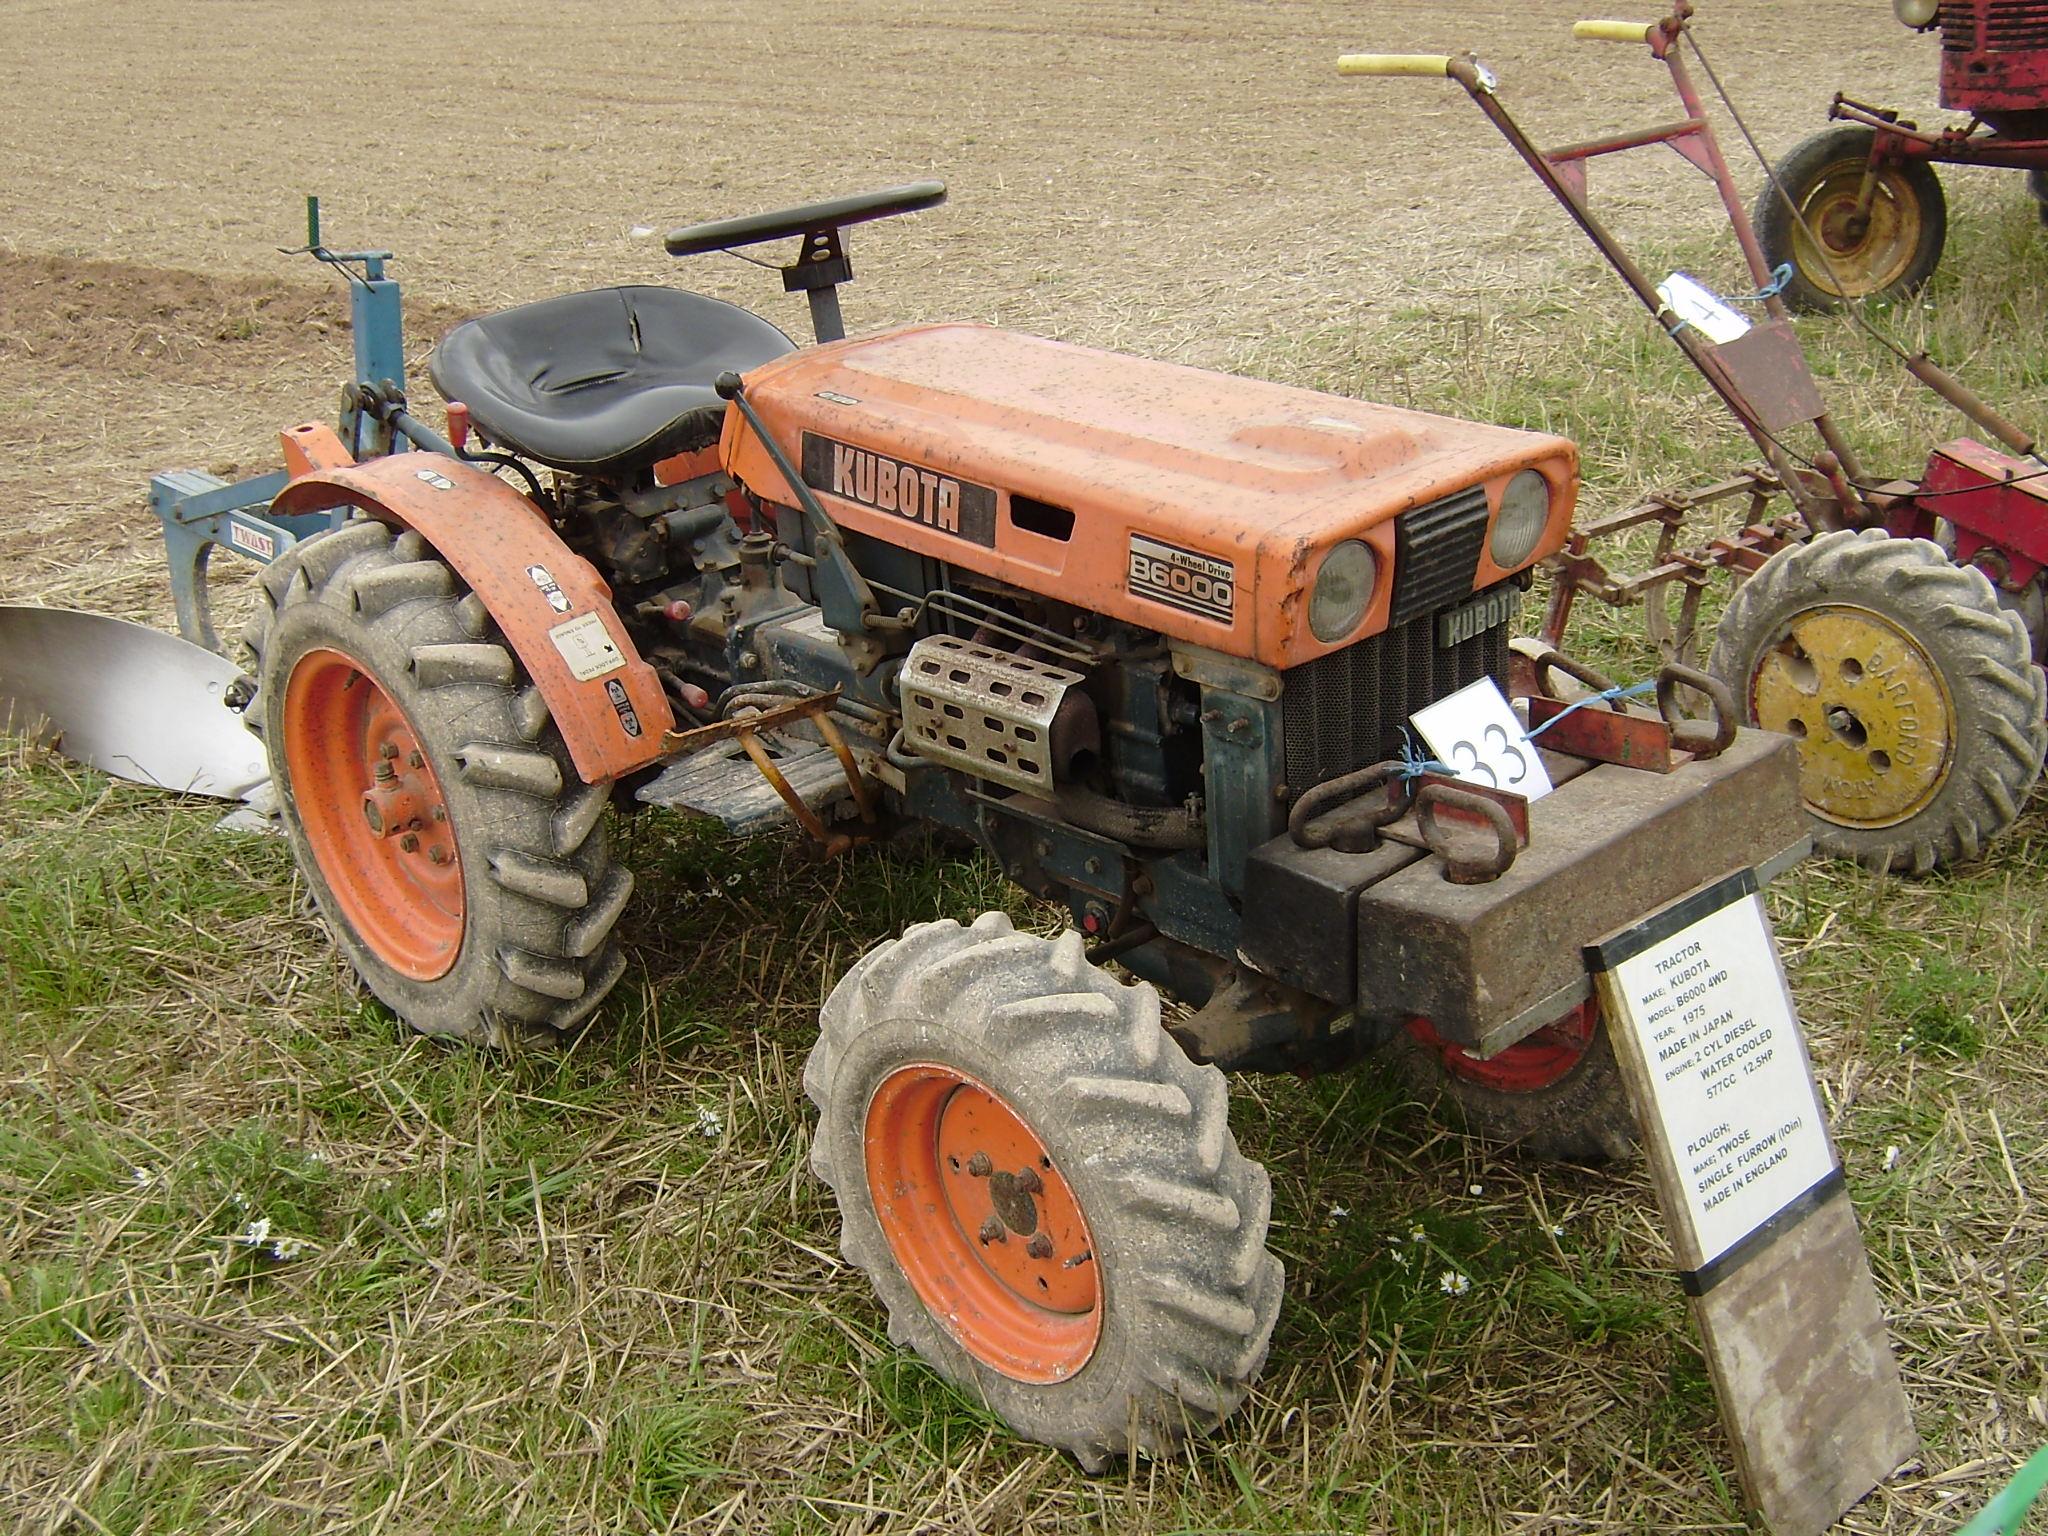 Garden Tractors | Tractor & Construction Plant Wiki | FANDOM powered ...